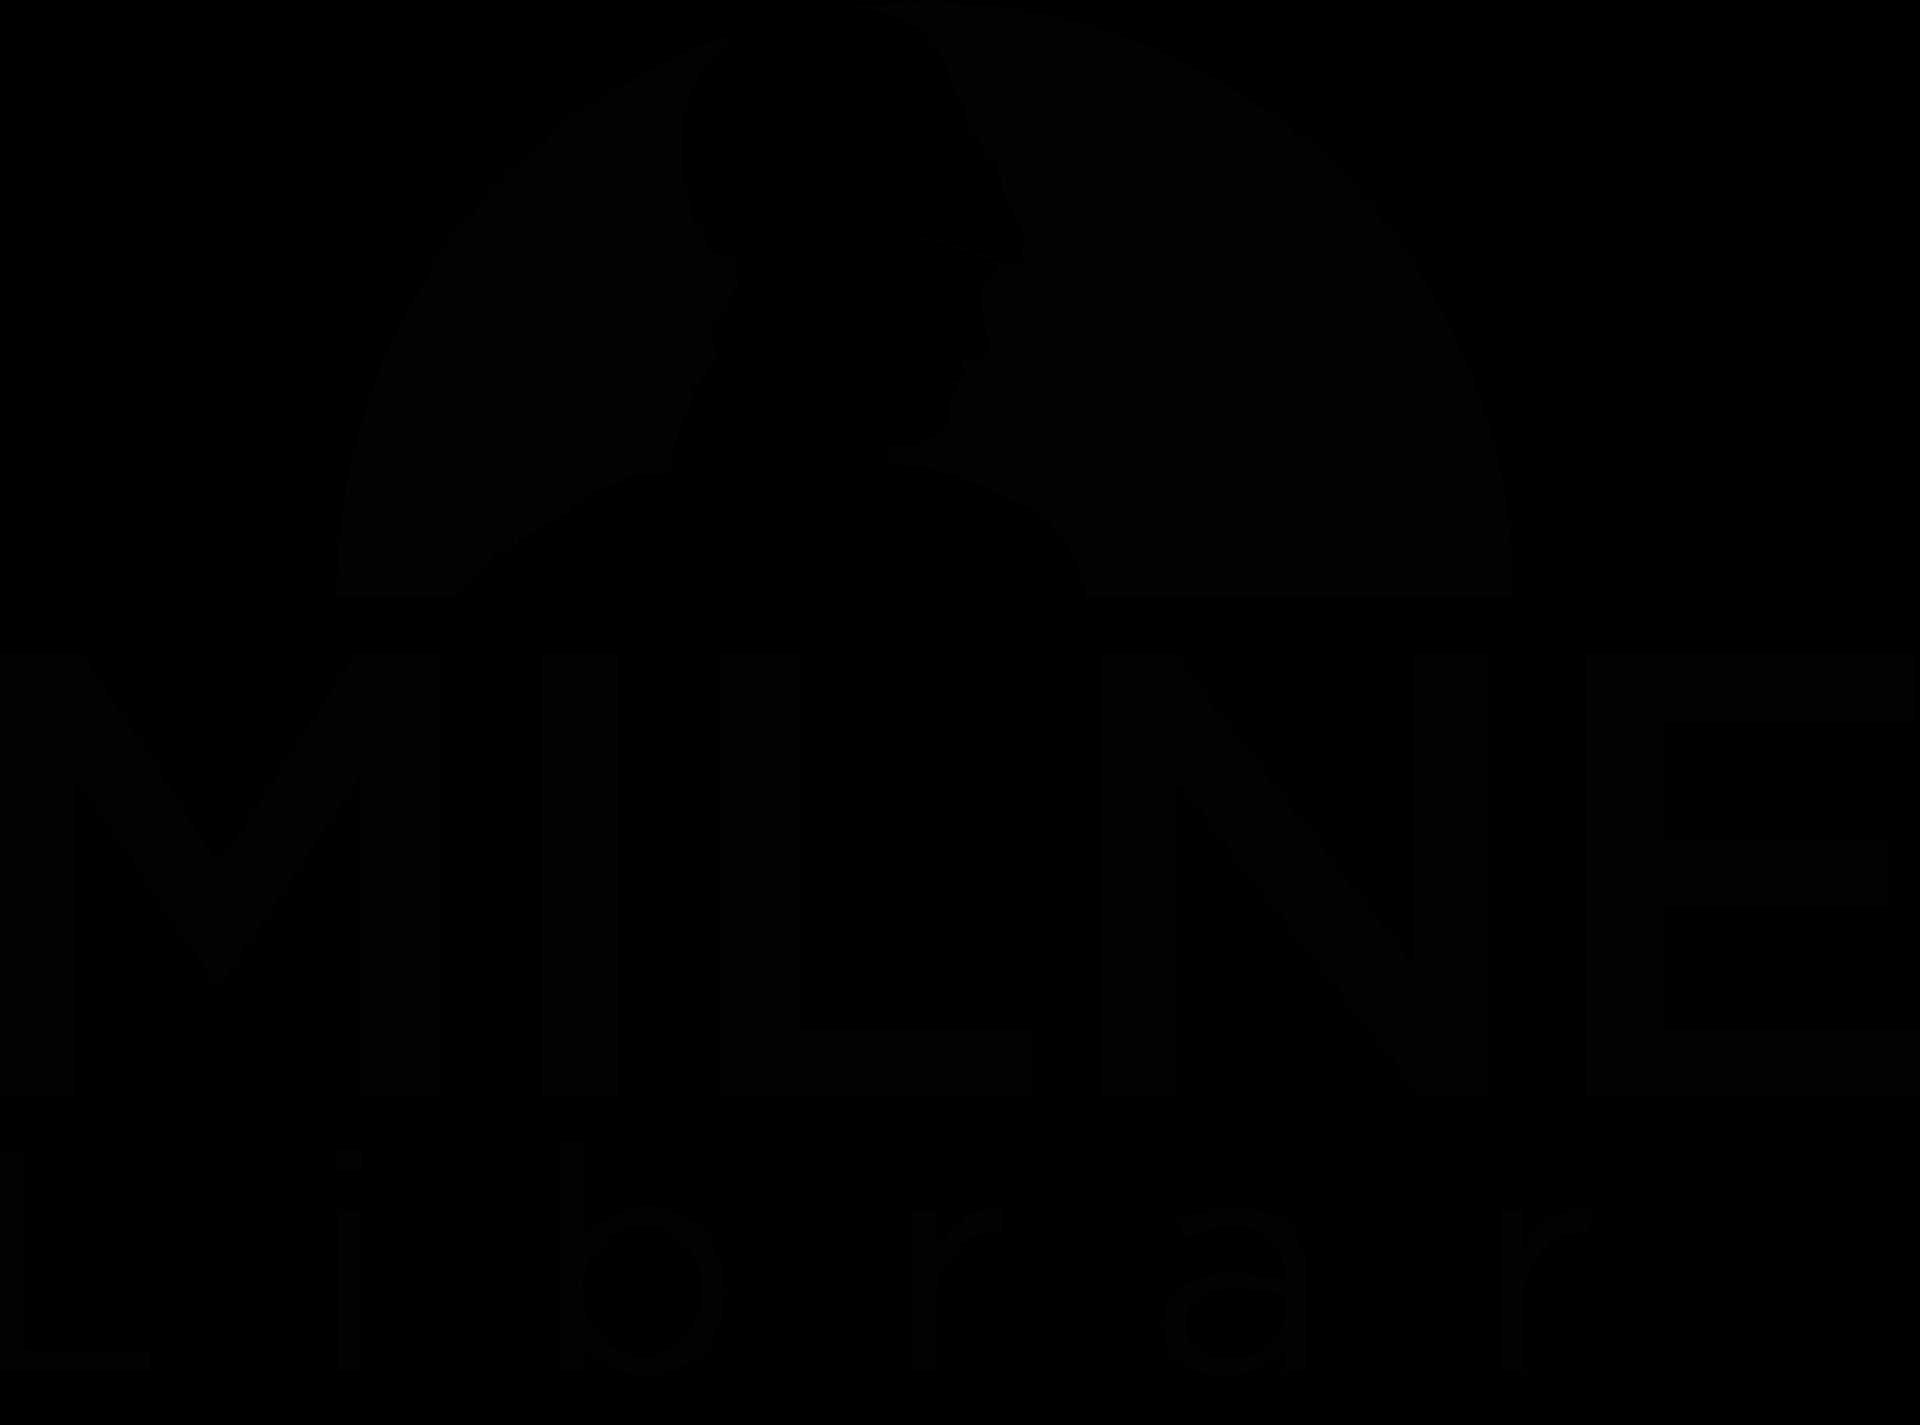 006 Autoethnography Example Essays Essay Milne Logo Black Best Sample Pdf Examples 1920